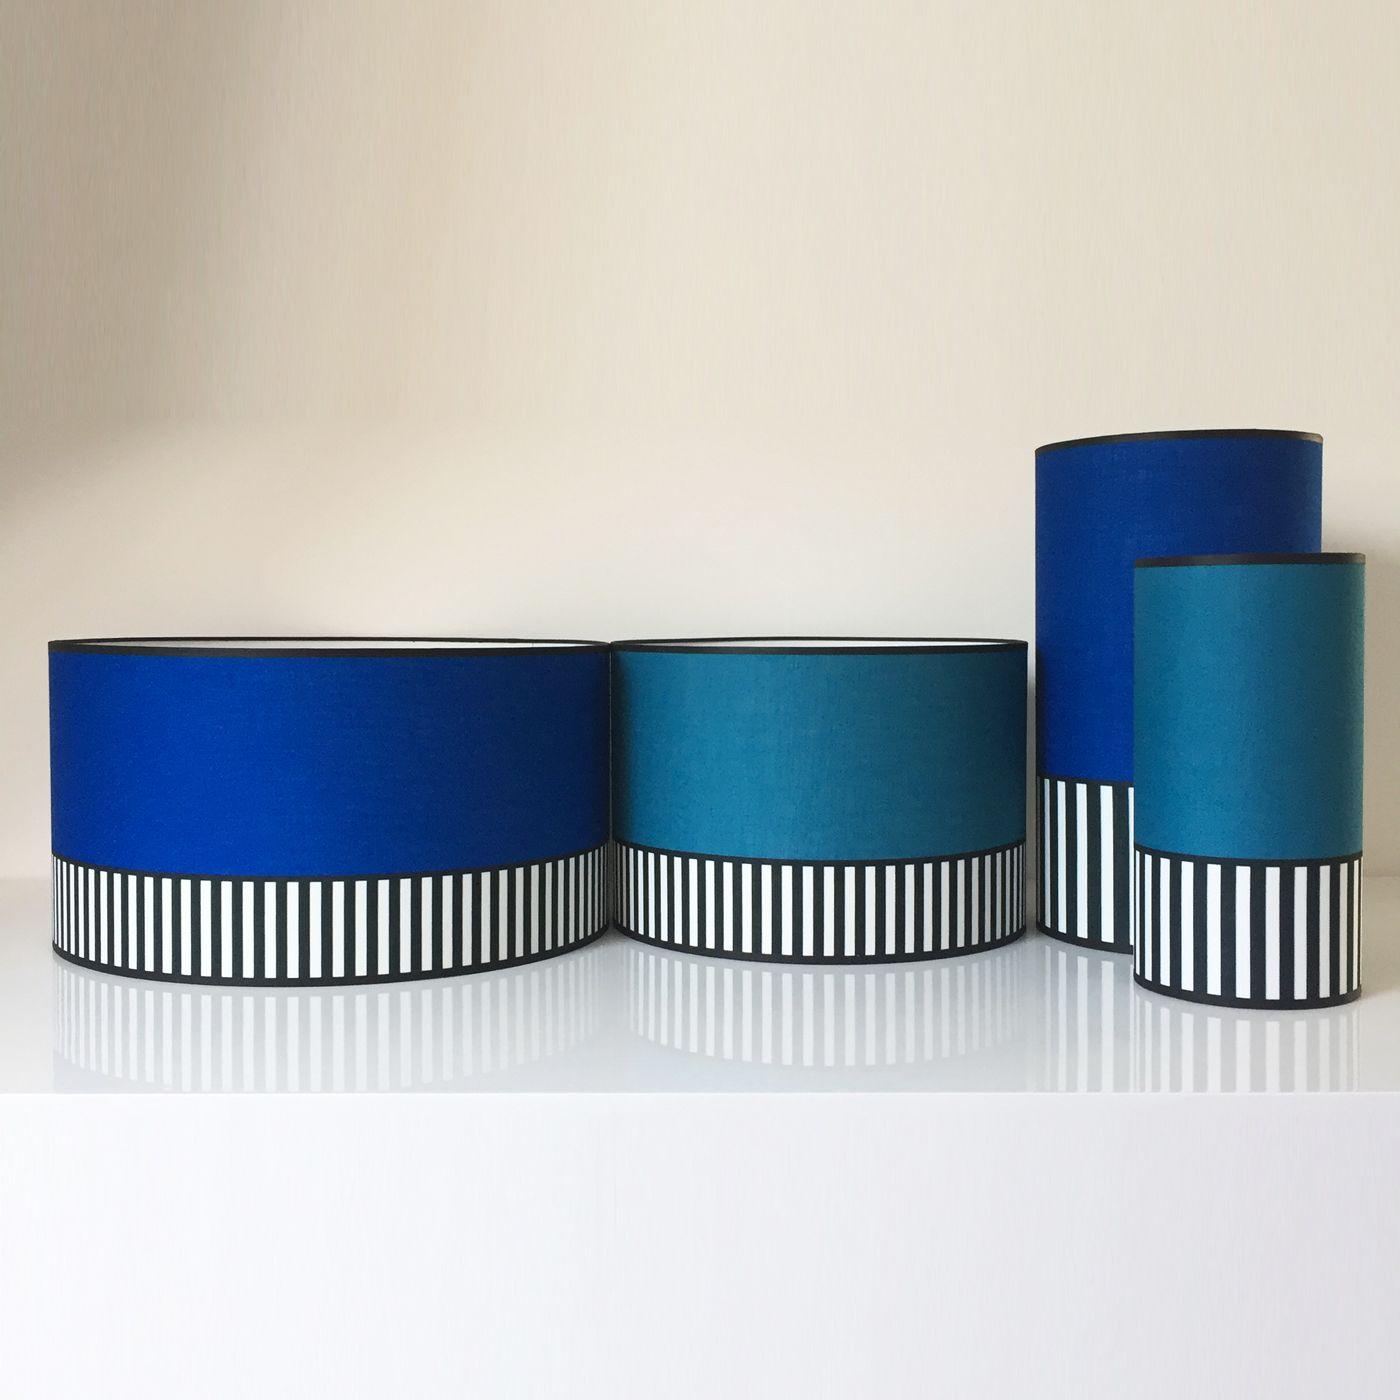 association d'abats-jours bleu canard et bleu indigo par la